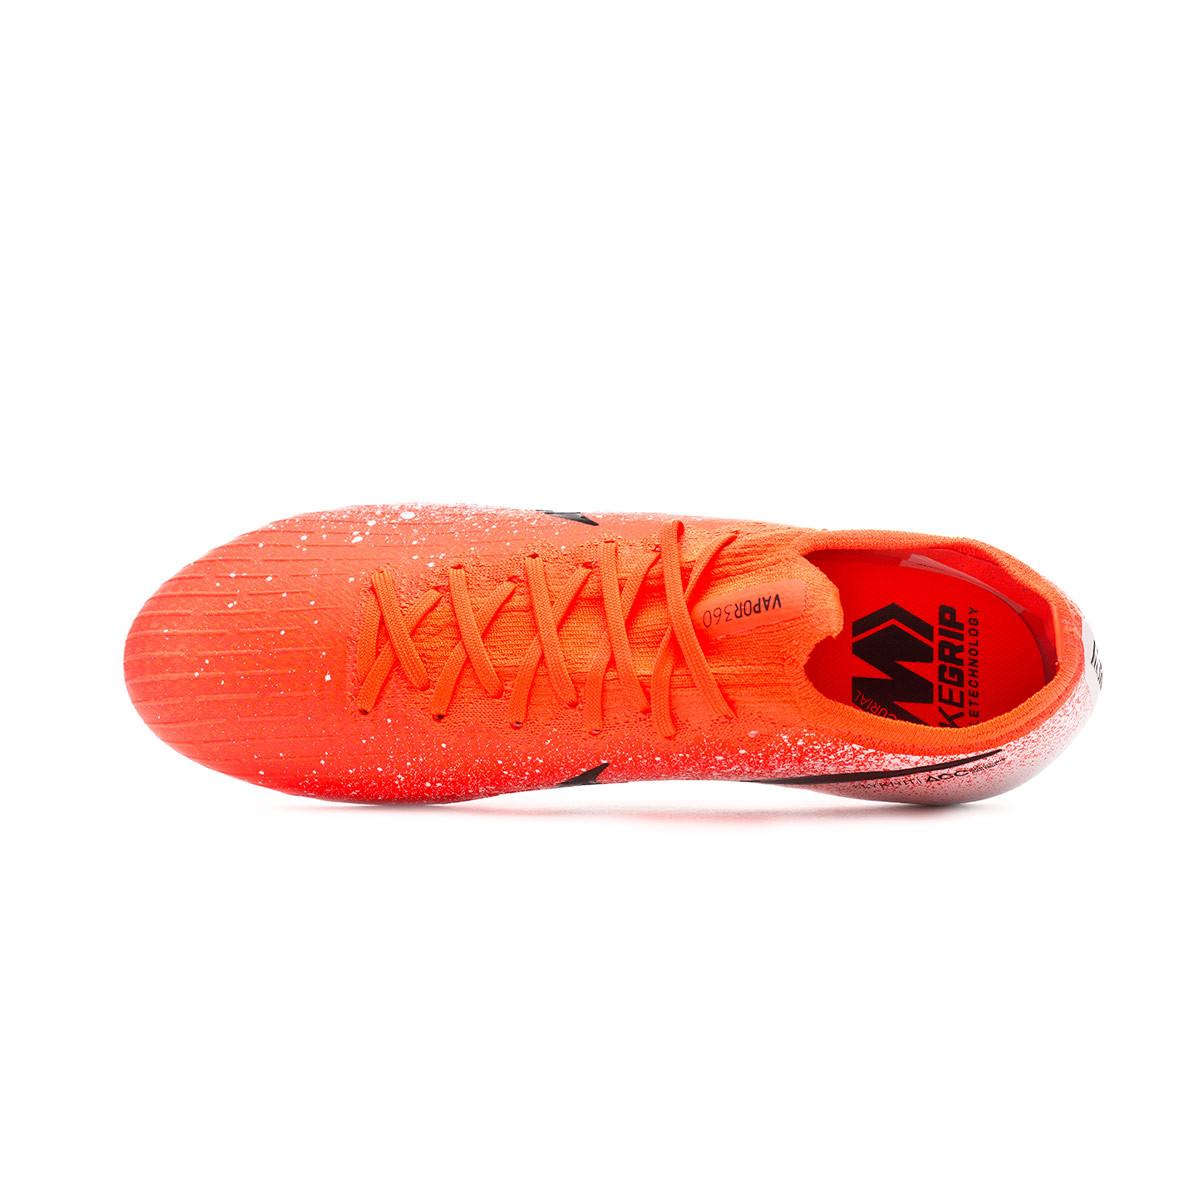 be5db89dc6b Football Boots Nike Mercurial Vapor XII Elite FG Hyper crimson-Black-White  - Football store Fútbol Emotion